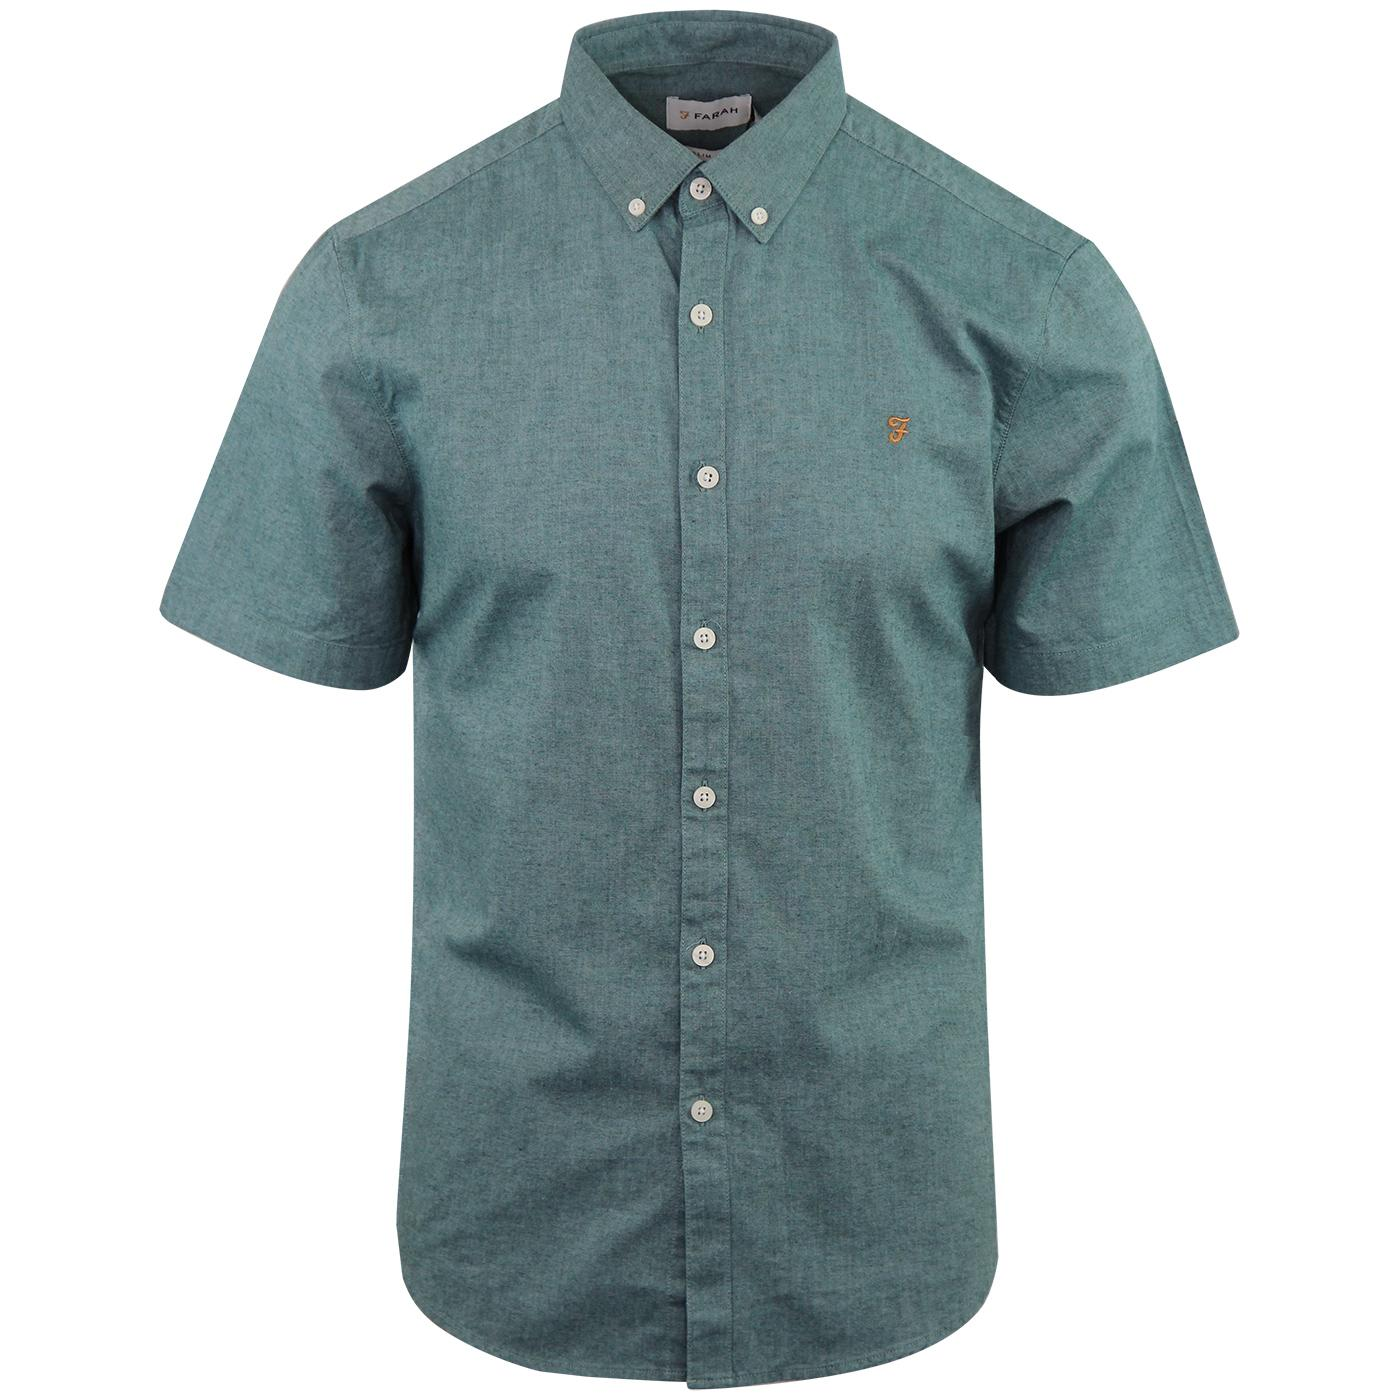 Steen FARAH 60s Mod Short Sleeve Oxford Shirt (MG)